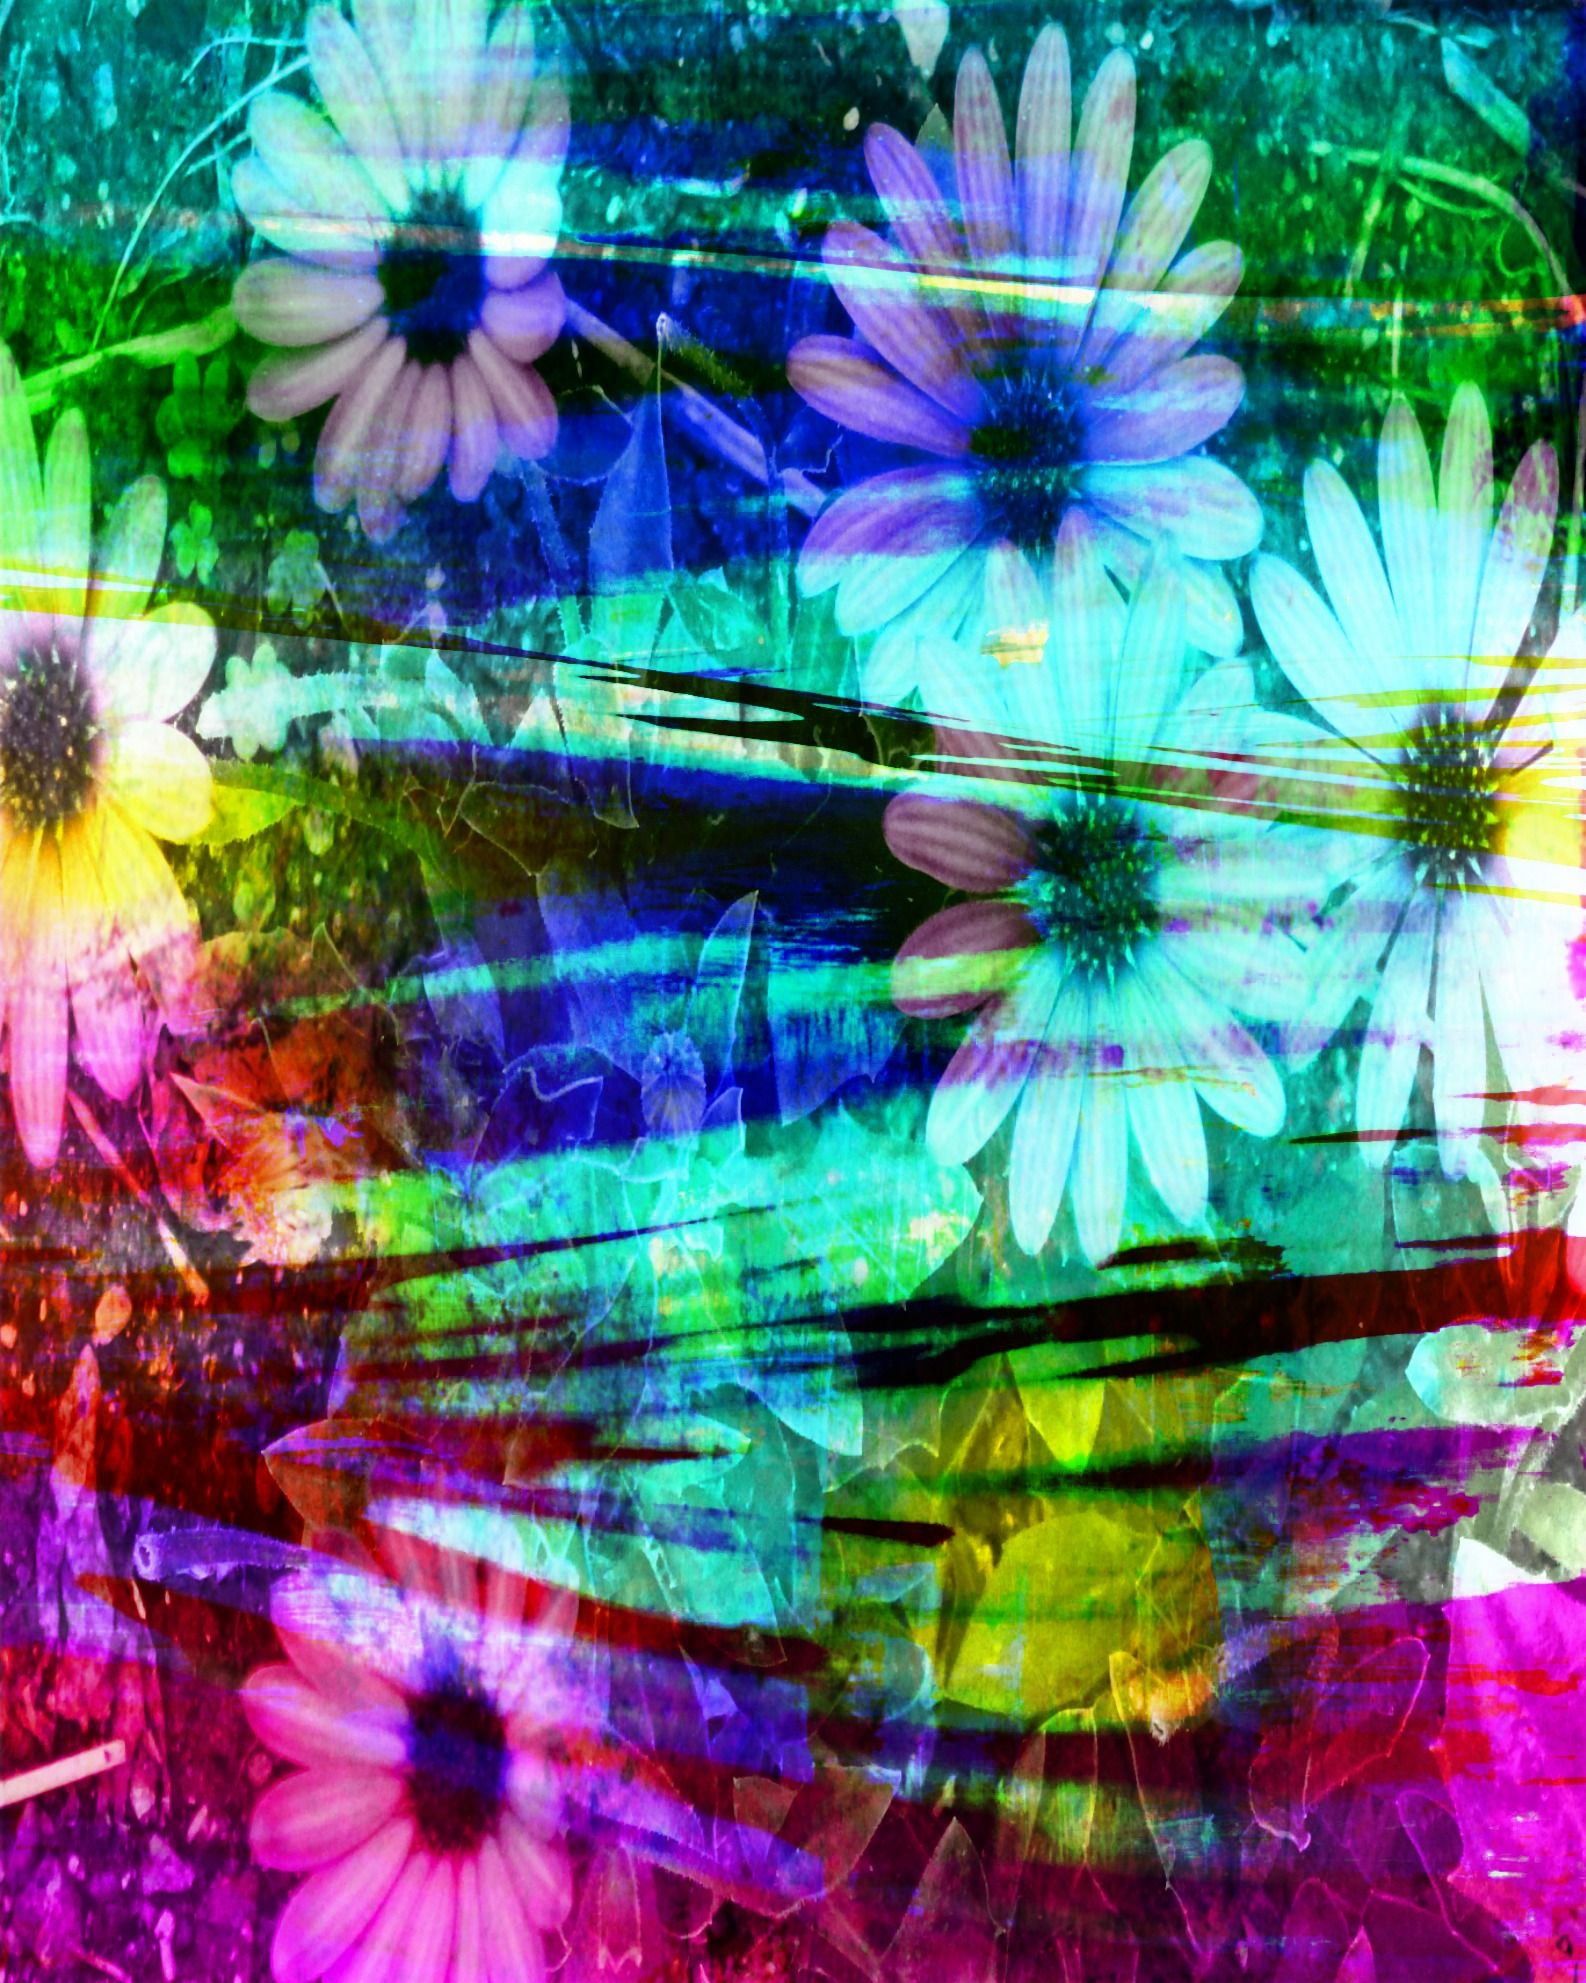 http://modavies.files.wordpress.com/2014/03/daisy-chain.jpg